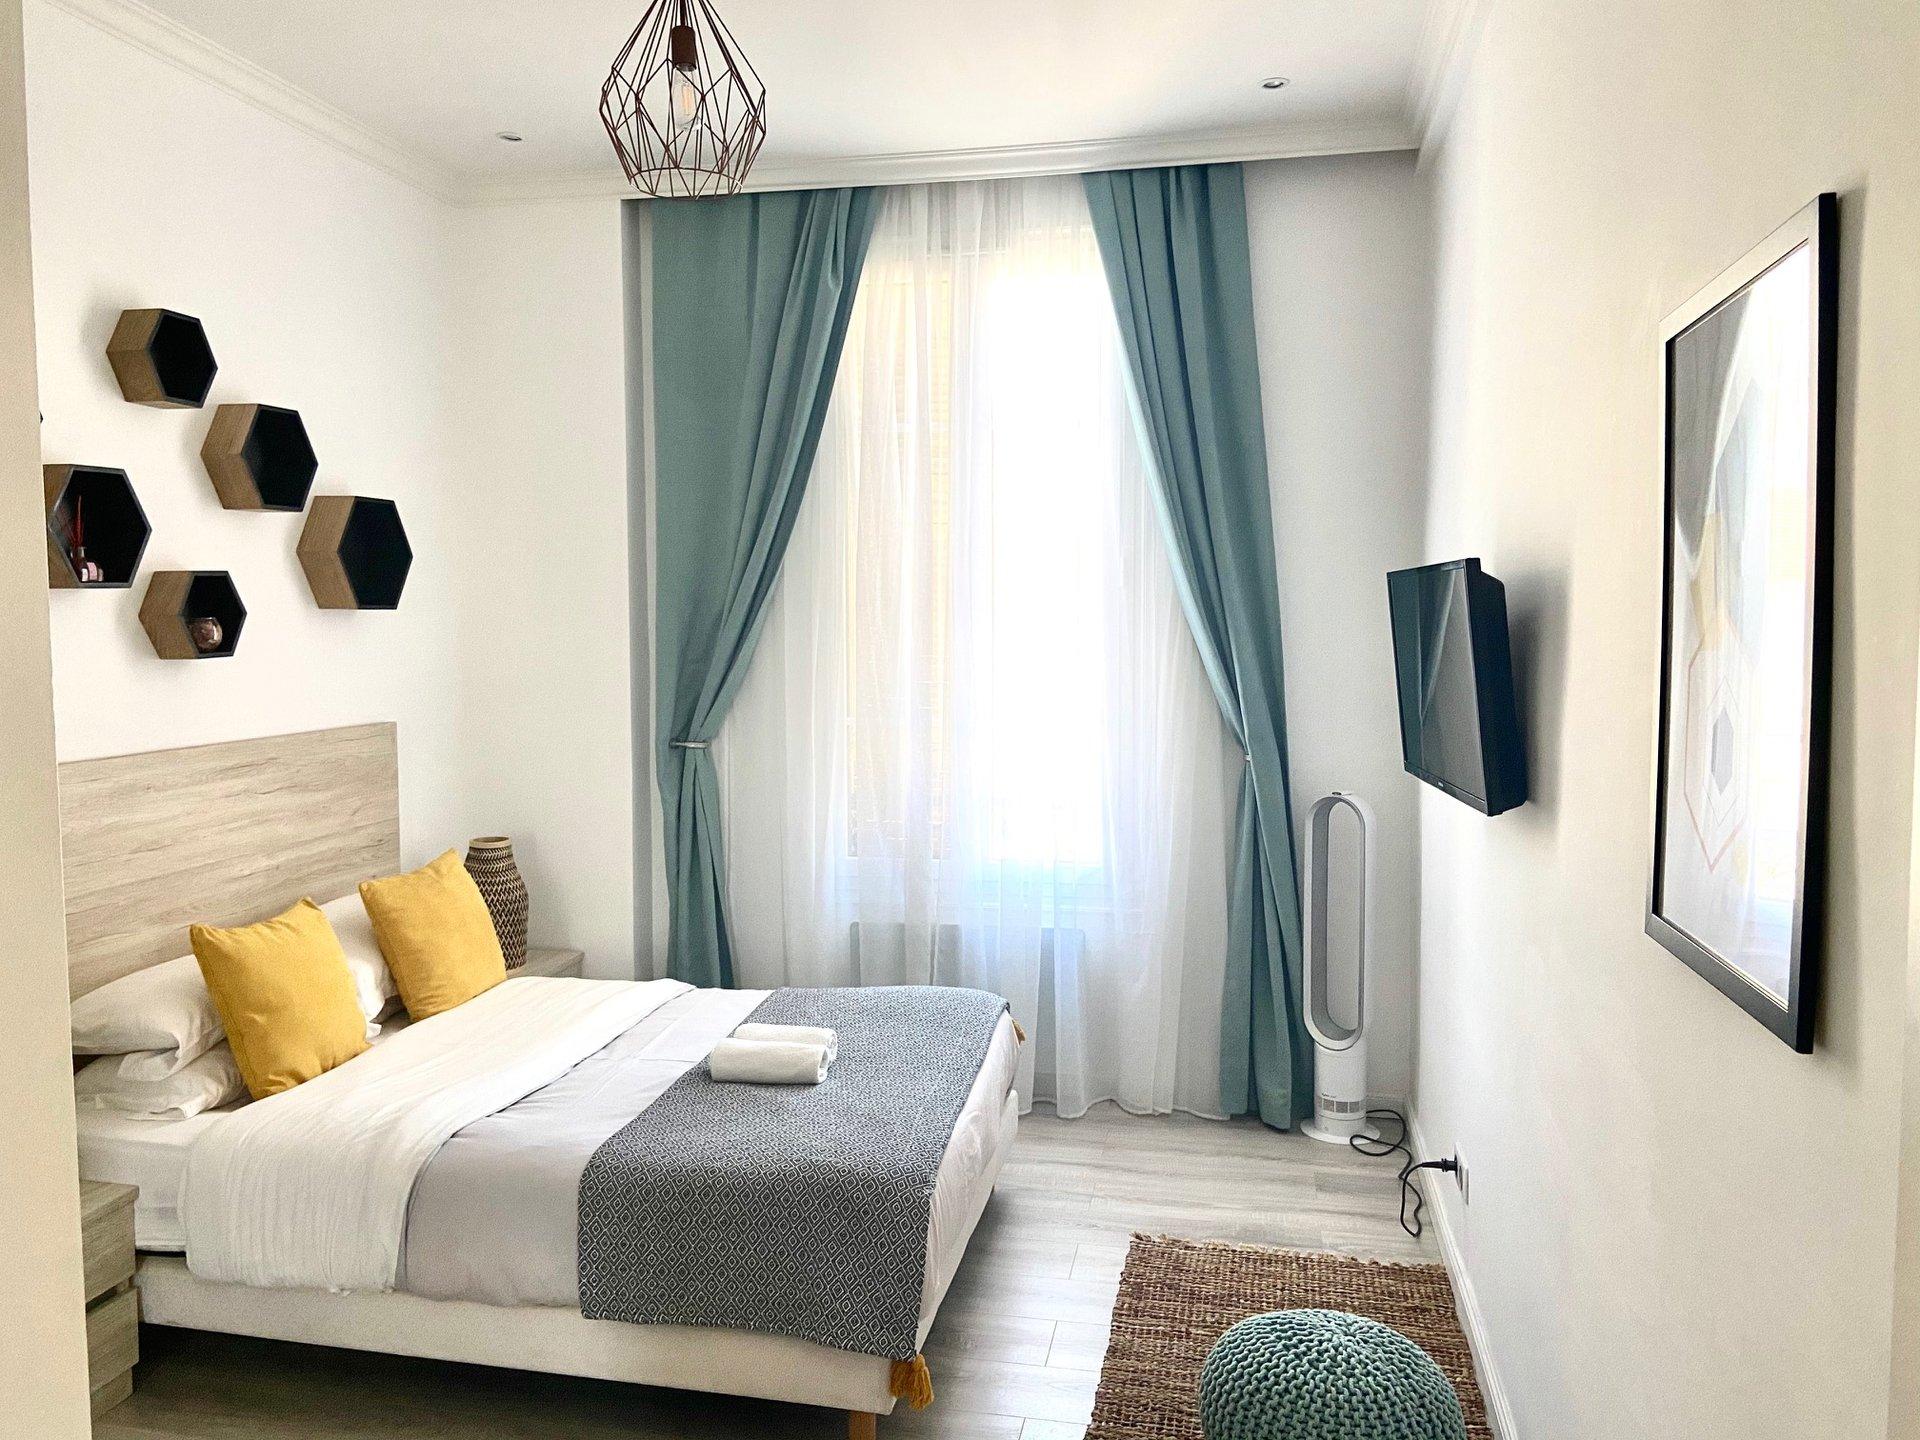 2 BEDROOMS APARTMENT PLACE GARIBALDI